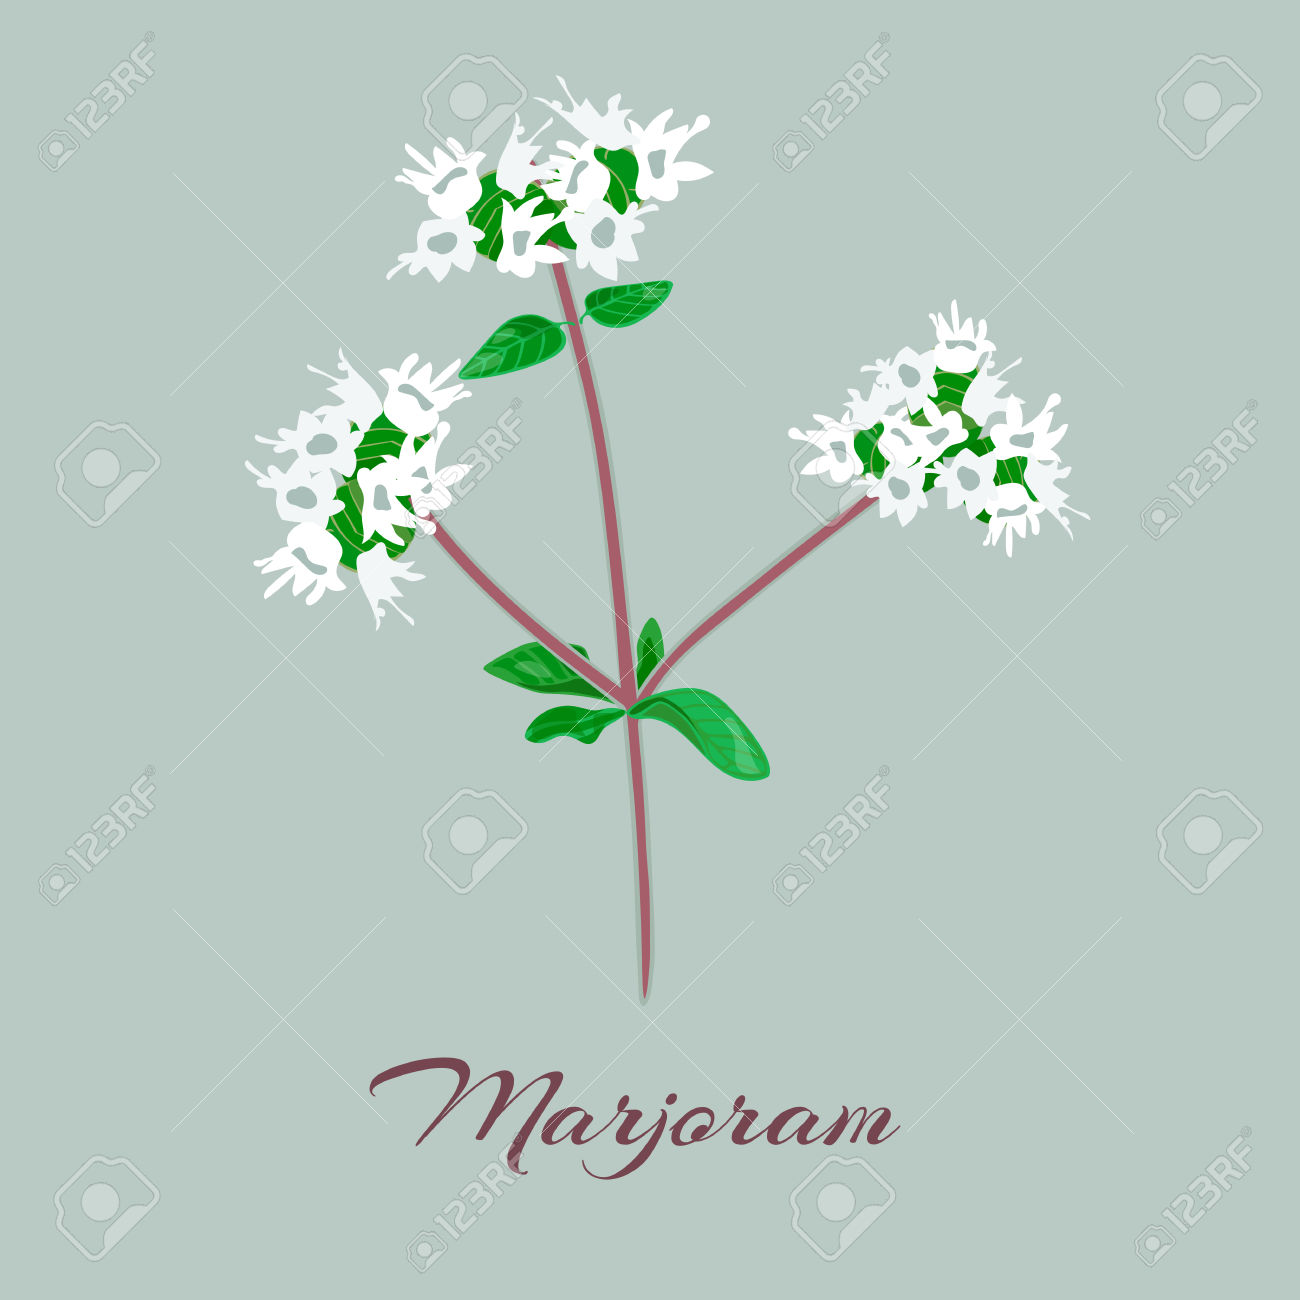 Marjoram Or Origanum Majorana. Flowers And Leaves. Vector.